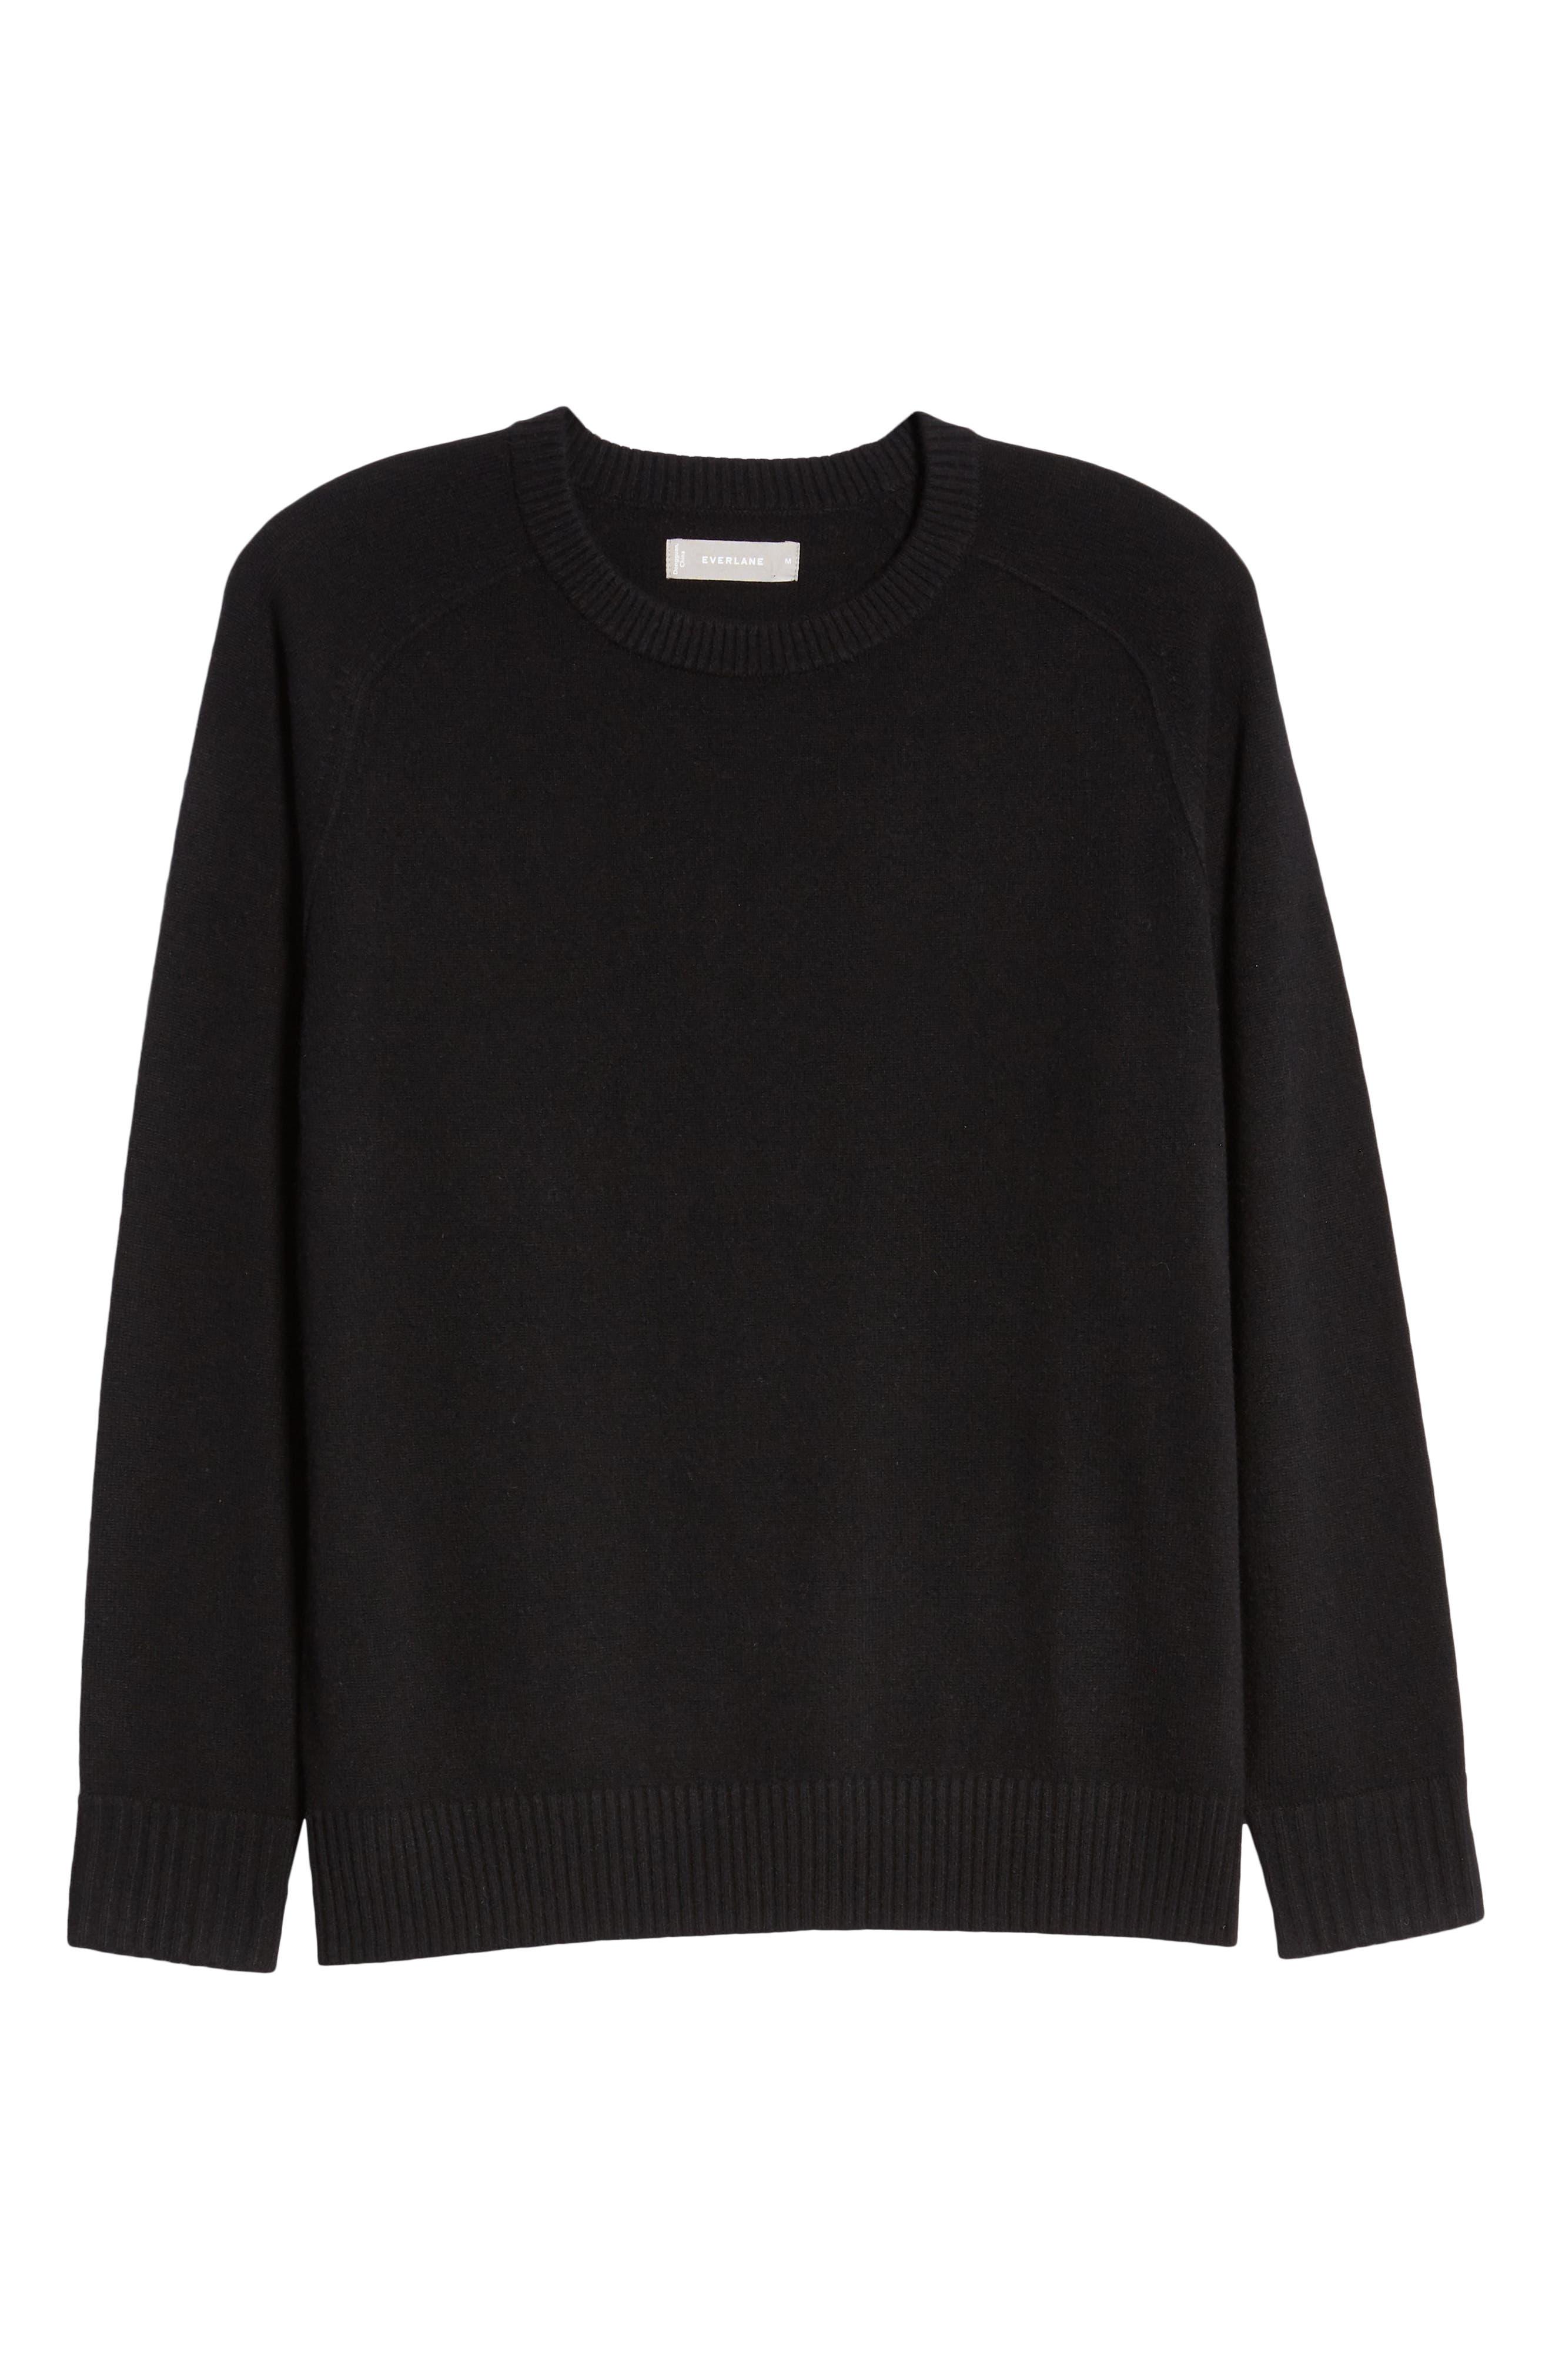 Image of EVERLANE Cashmere Blend Crew Neck Sweater